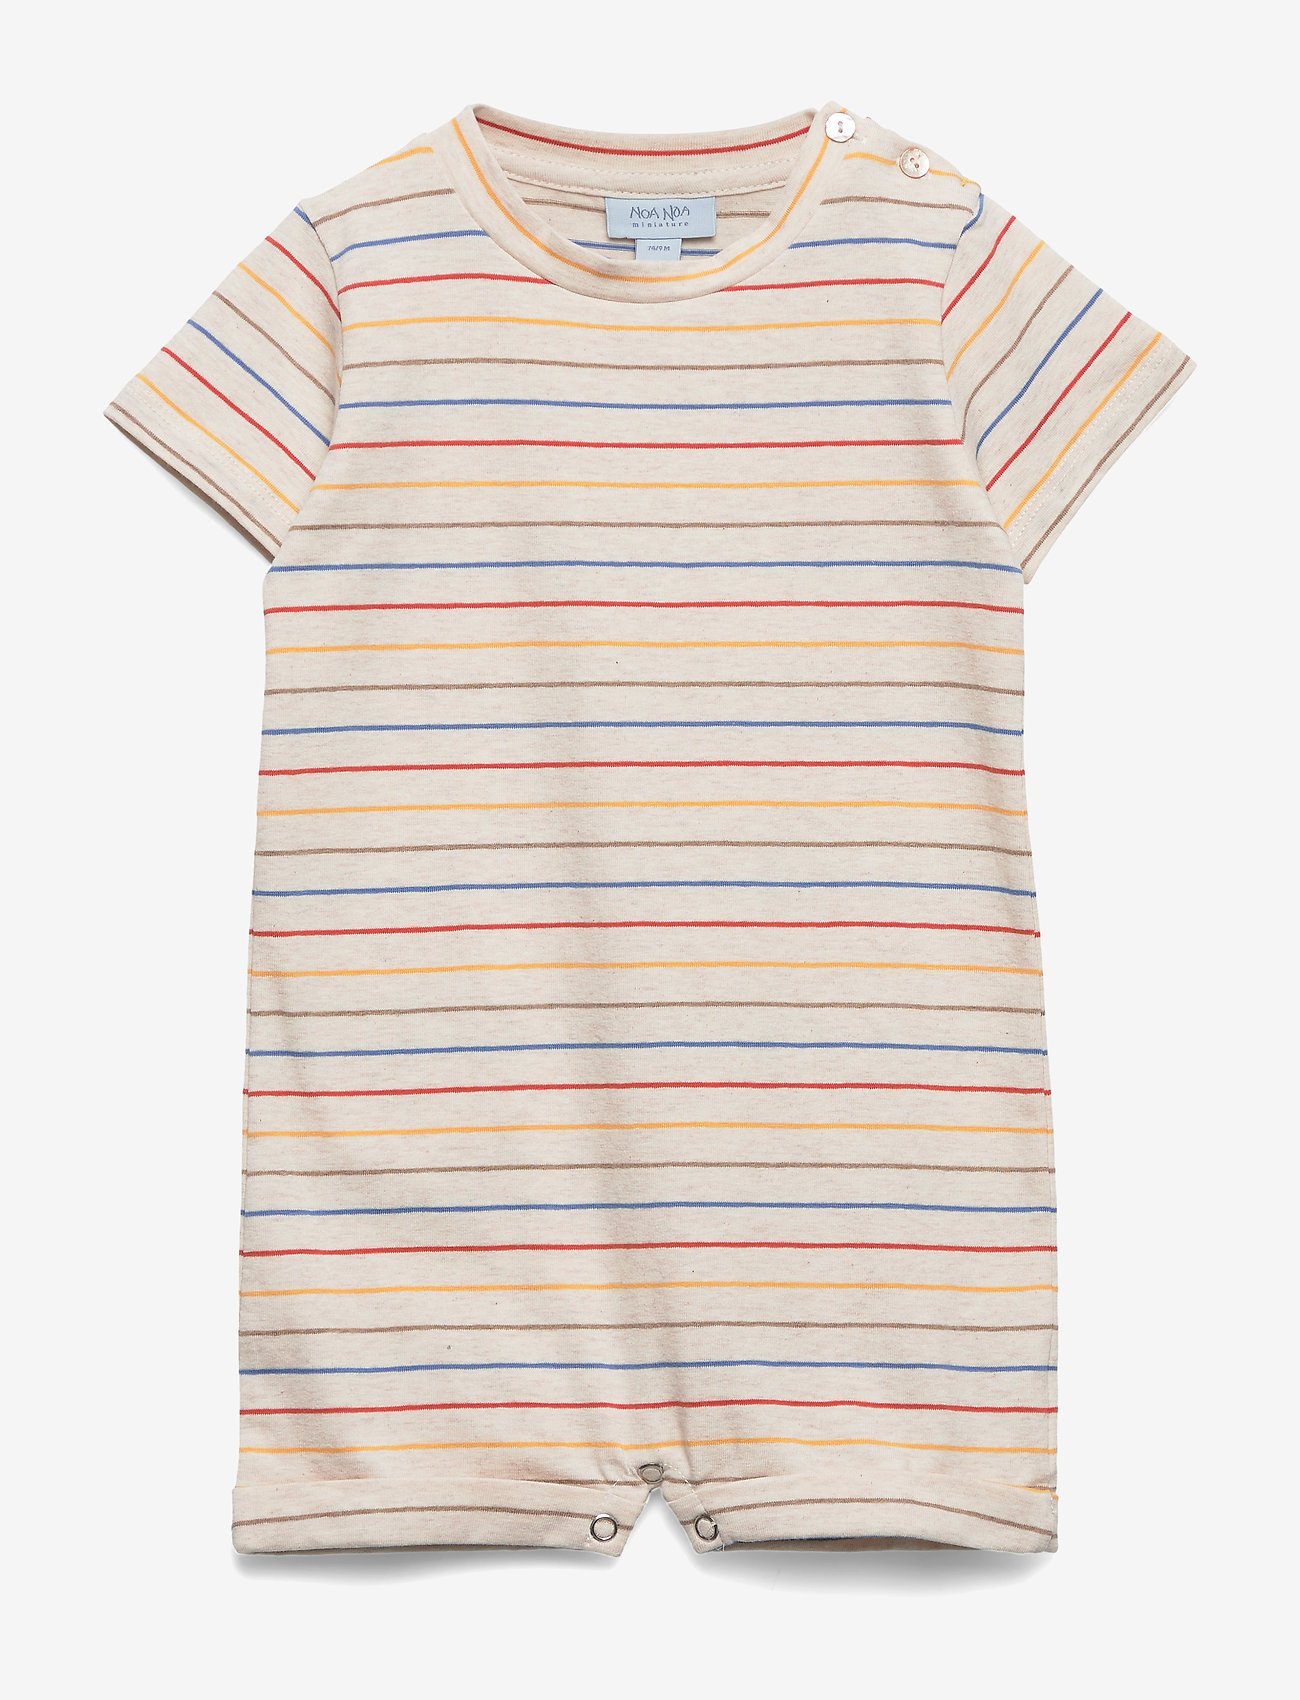 Noa Noa Miniature - Jumpsuit - short-sleeved - multicolour - 0